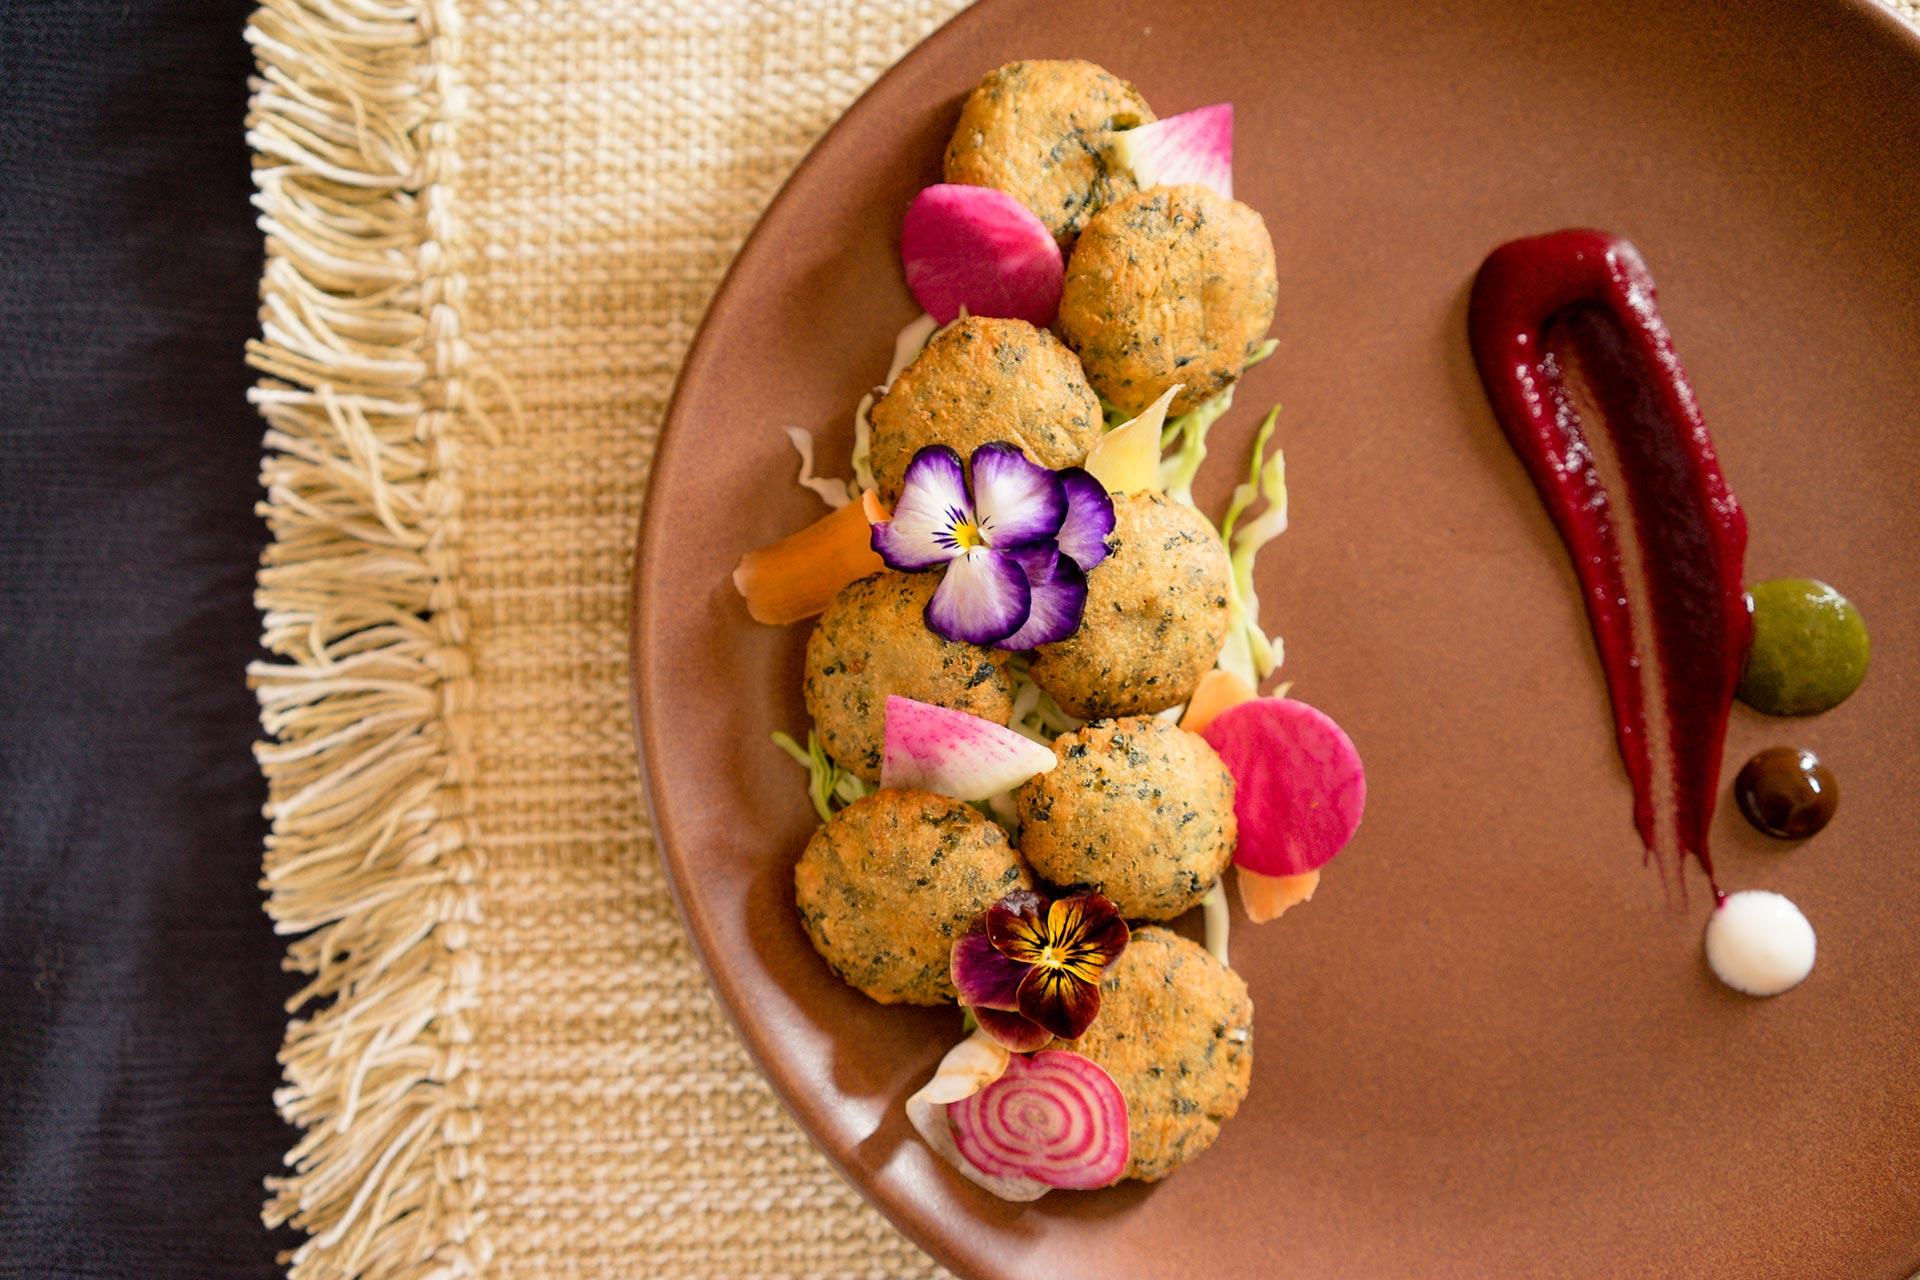 keeva-sf-restaurant-food-photographer-a-few-good-clicks-17.jpg